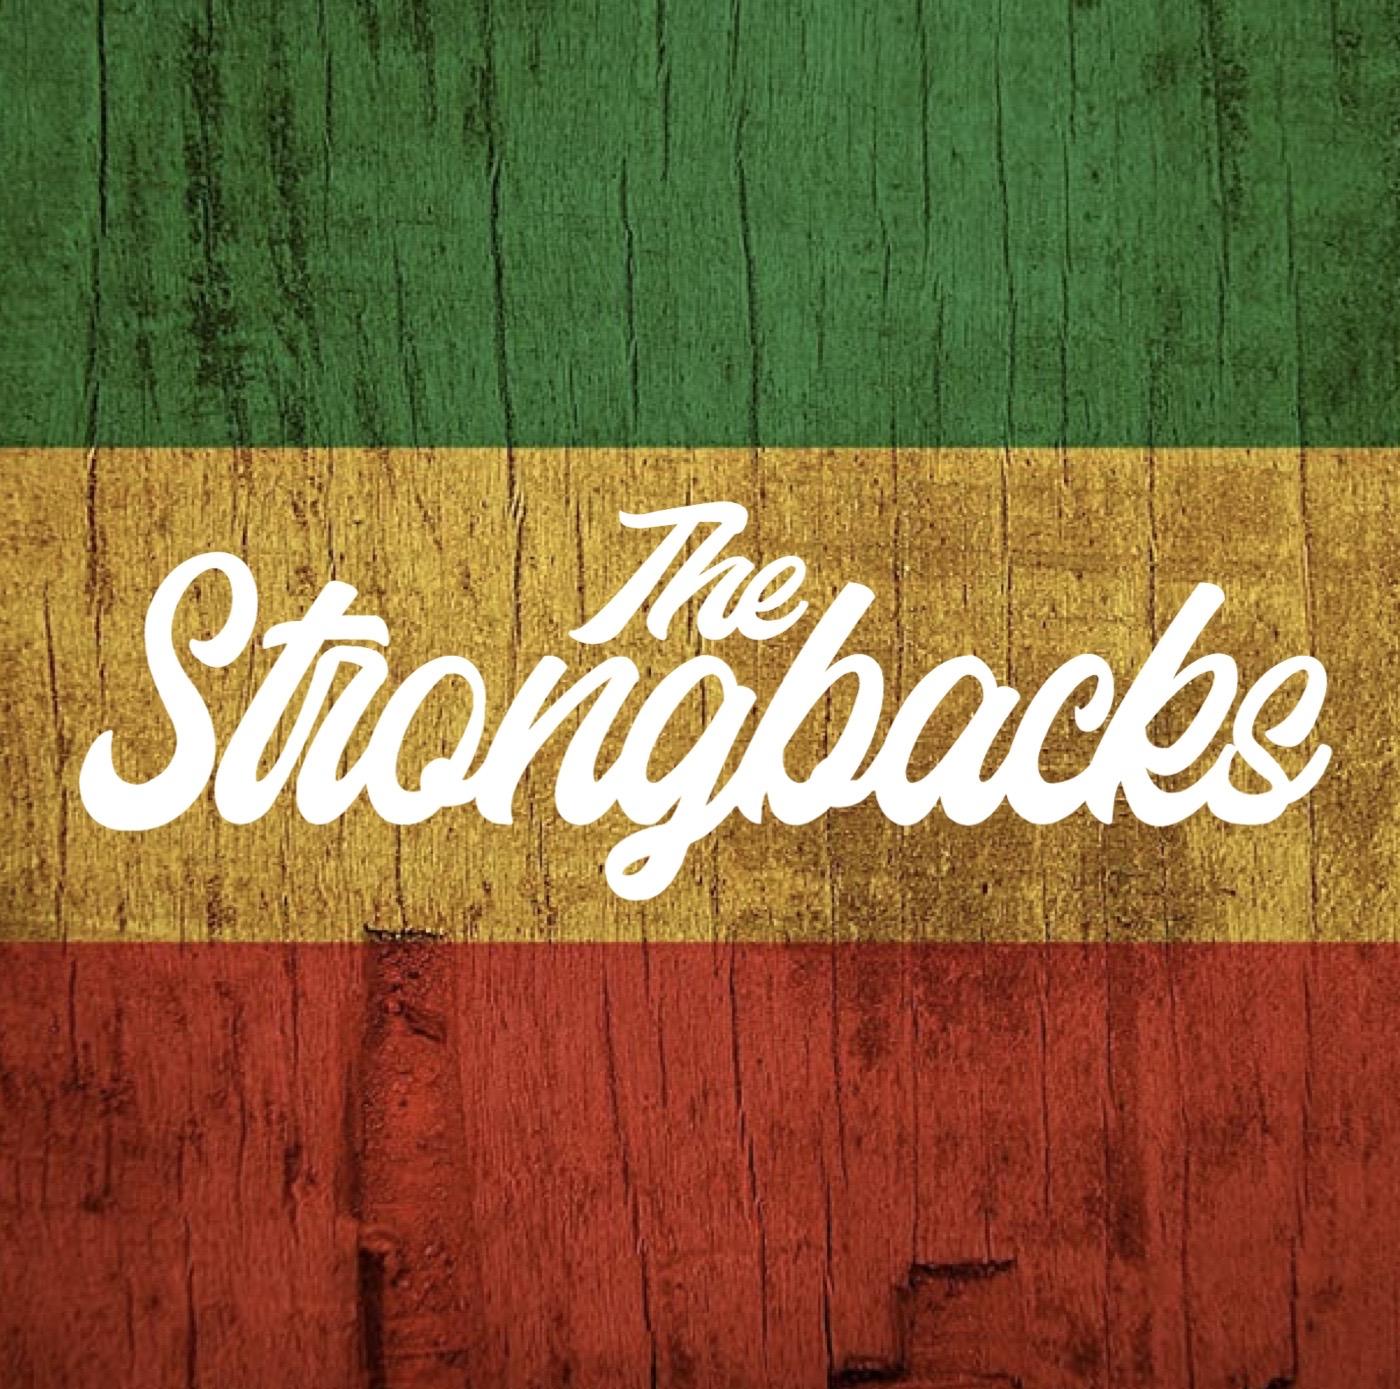 The Strongbacks EP